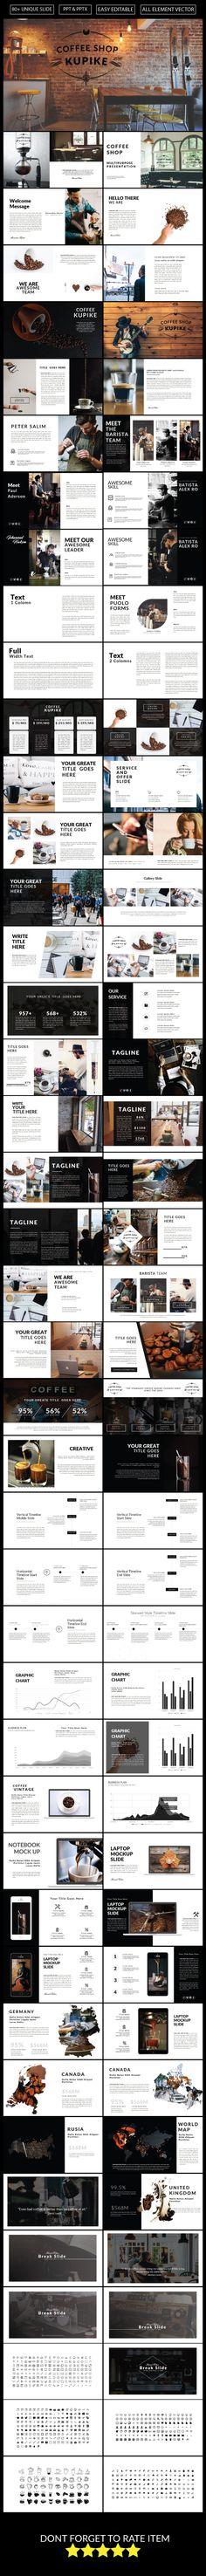 Coffee Kupike Multipurpose Powerpoint Template